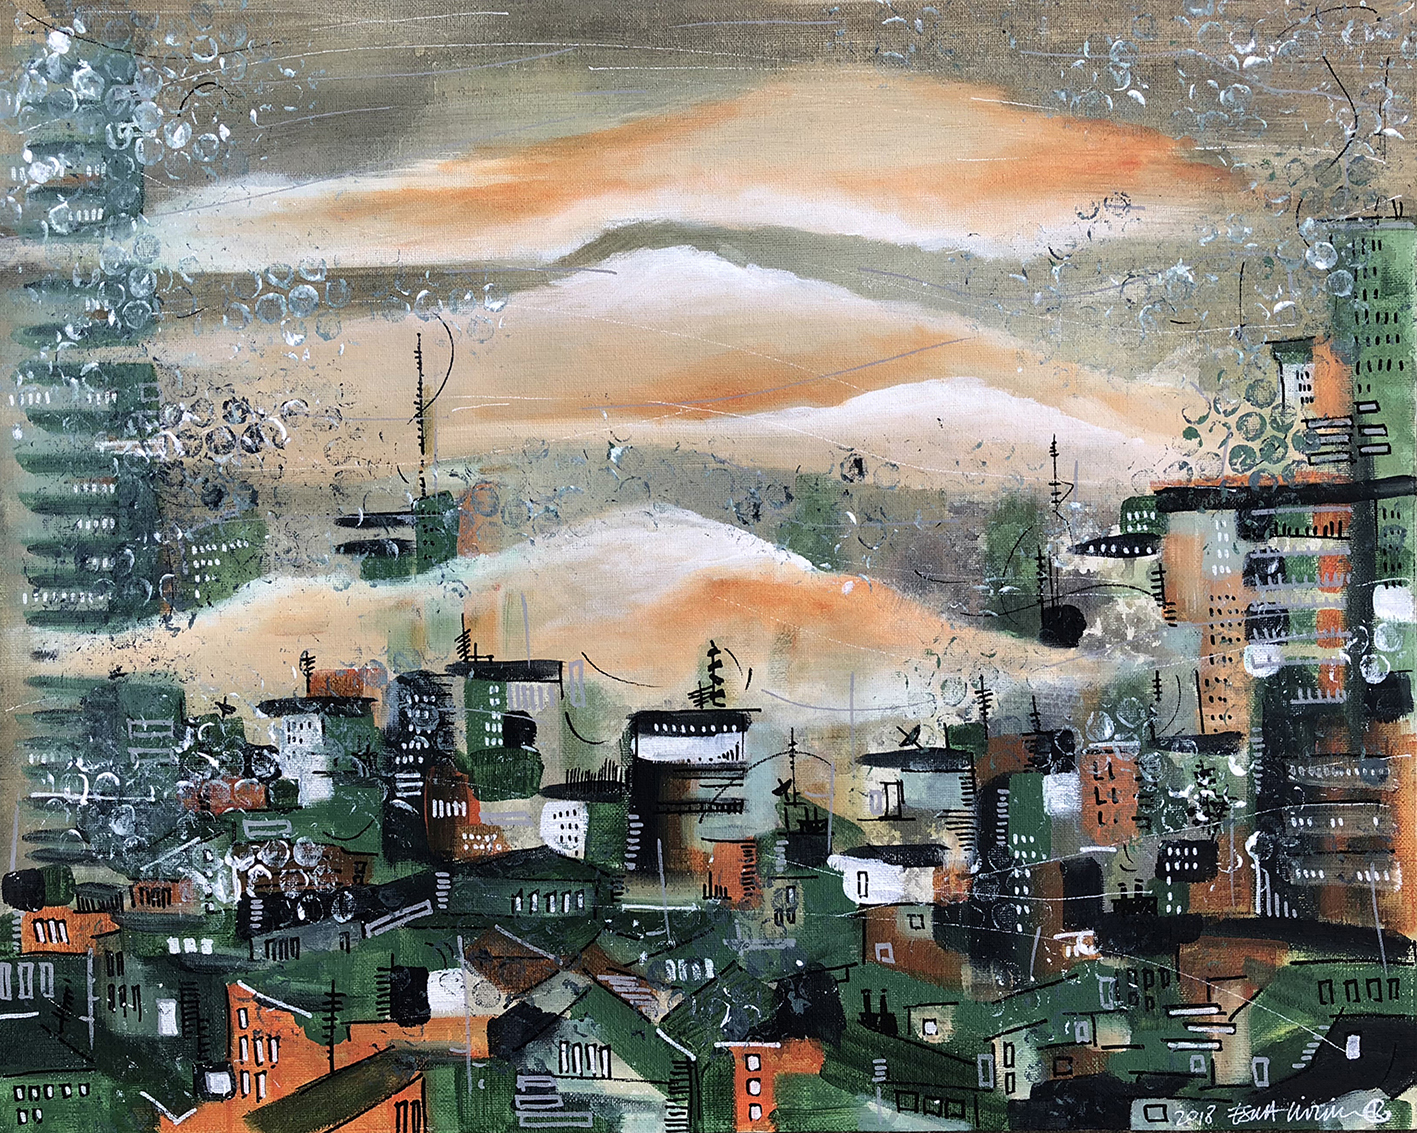 Untitled City, 2018 | Acrylic on canvas panel | 35 x 50 cm | £650